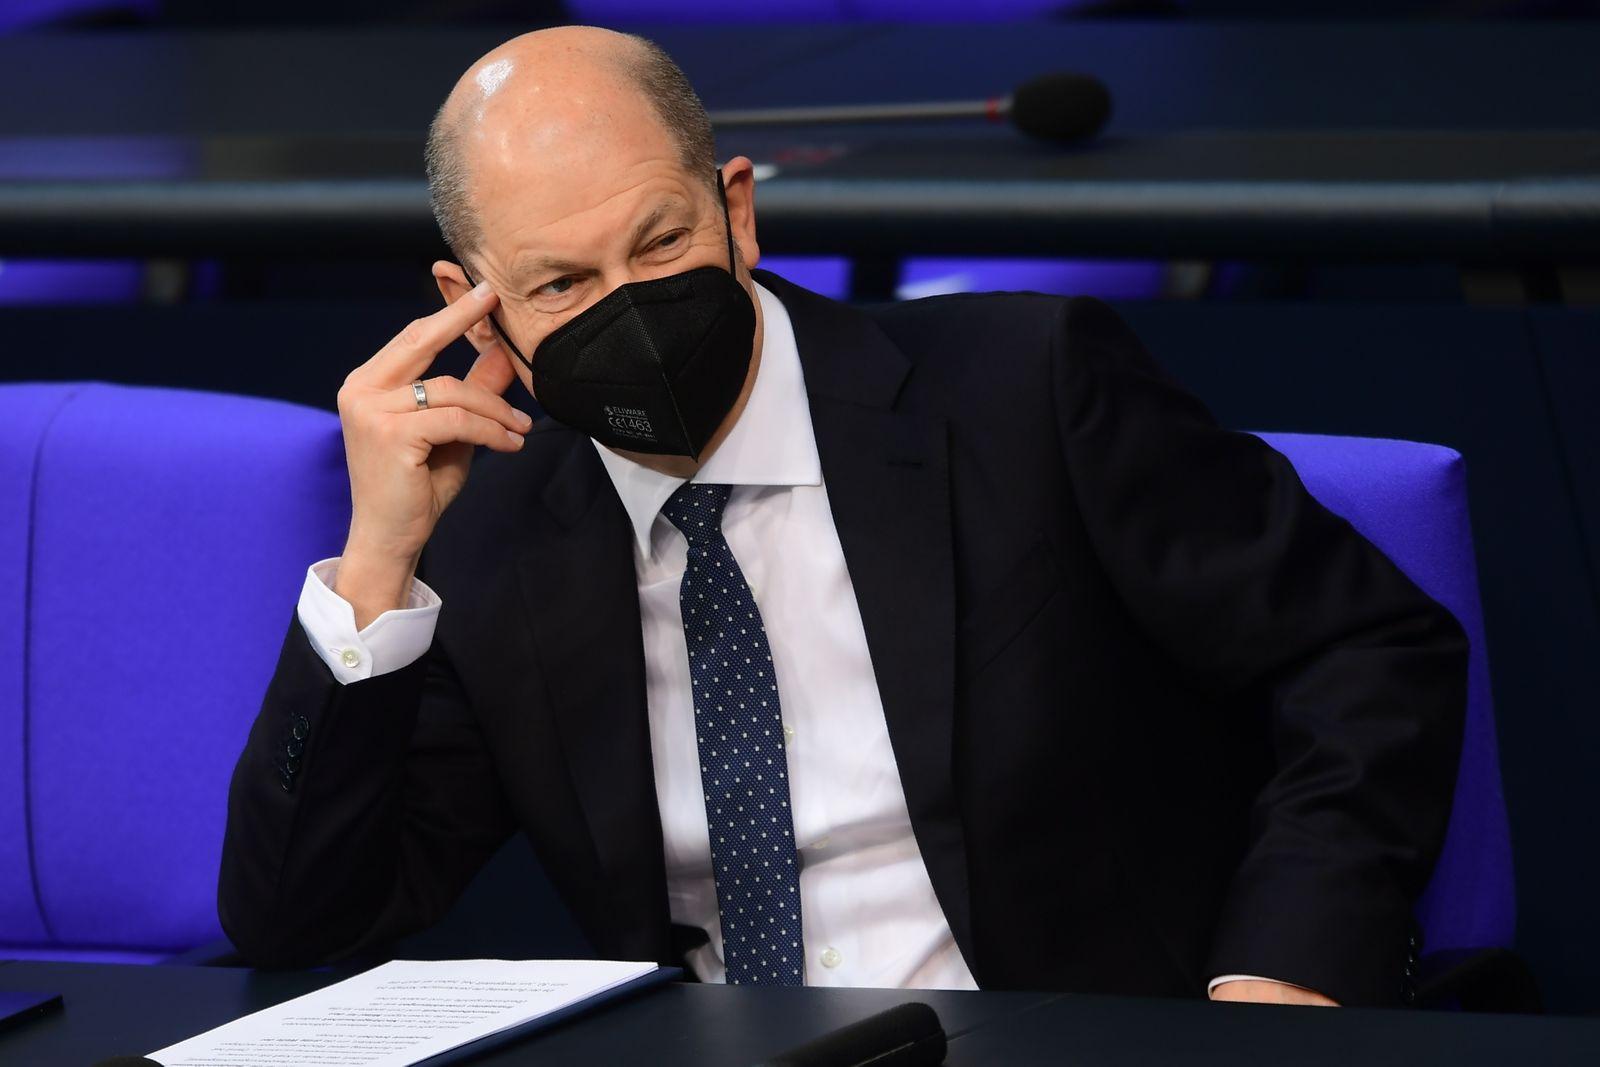 German Parliament ?Bundestag? discusses supplementary budget